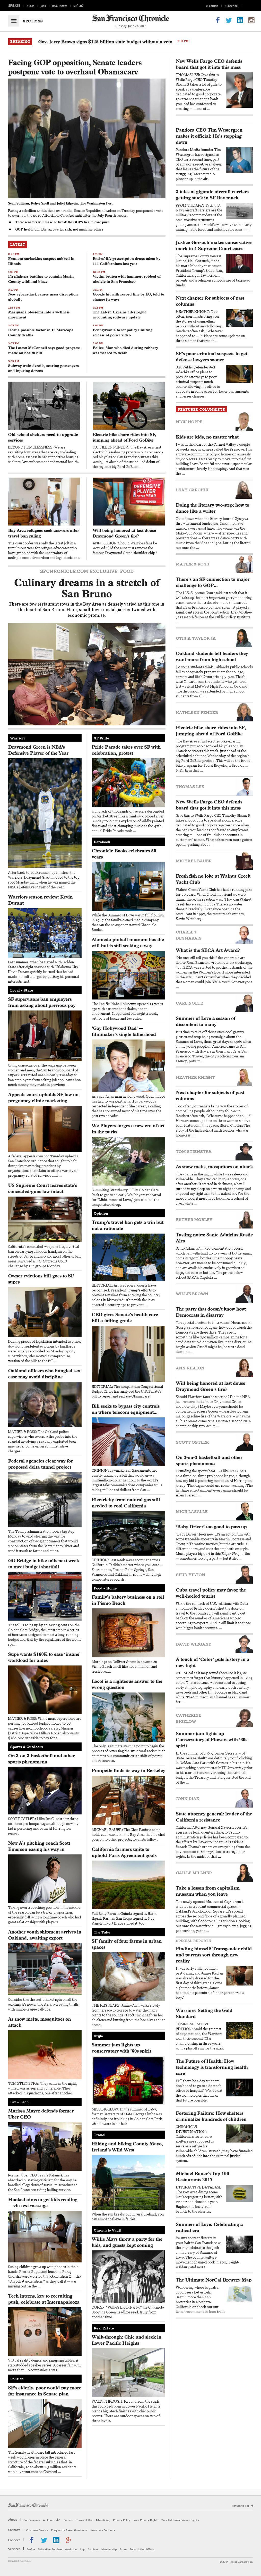 San Francisco Chronicle at Tuesday June 27, 2017, 10:17 p.m. UTC